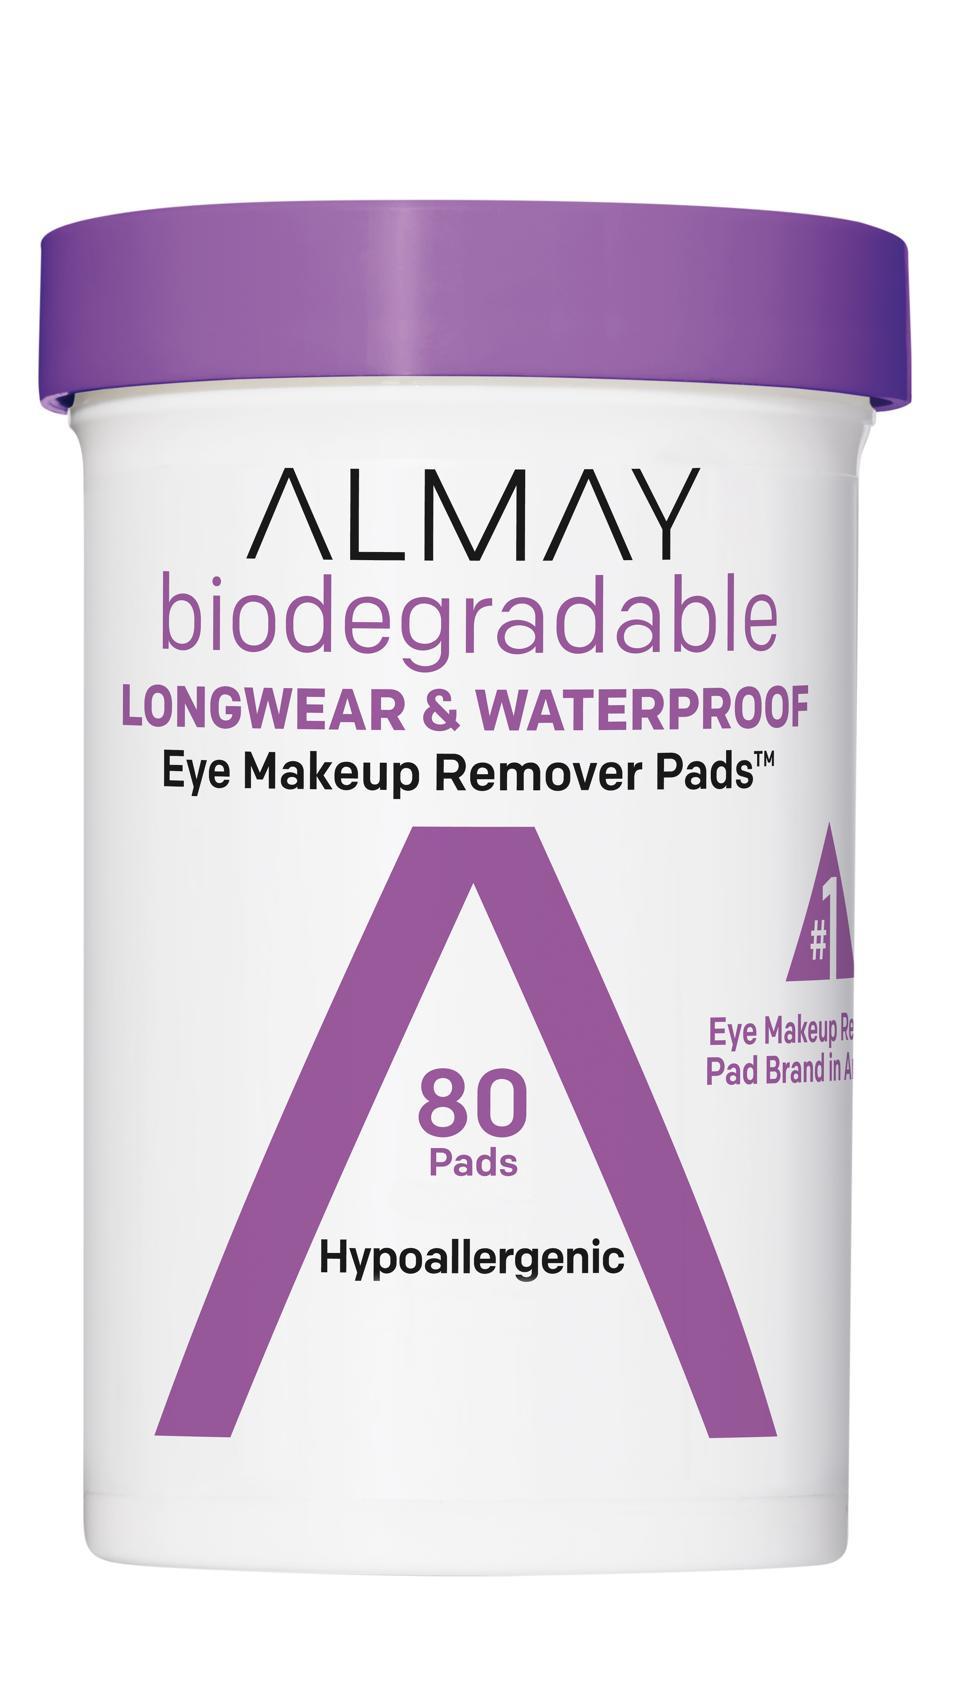 Almay Biodegradable Longwear & Waterproof Eye Makeup Remover Pads